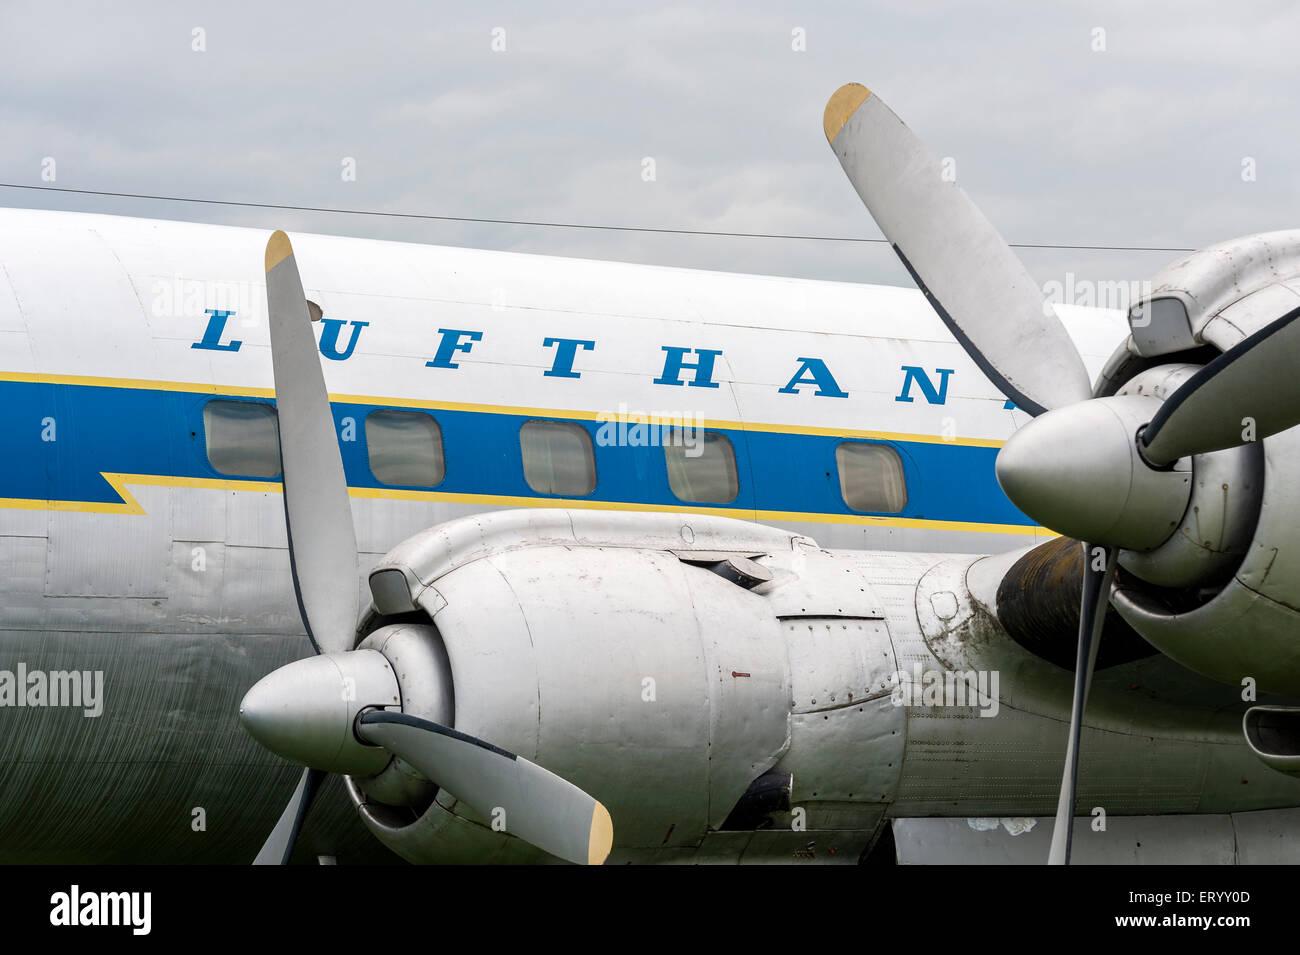 Classic Lufthansa Airplane - Stock Image